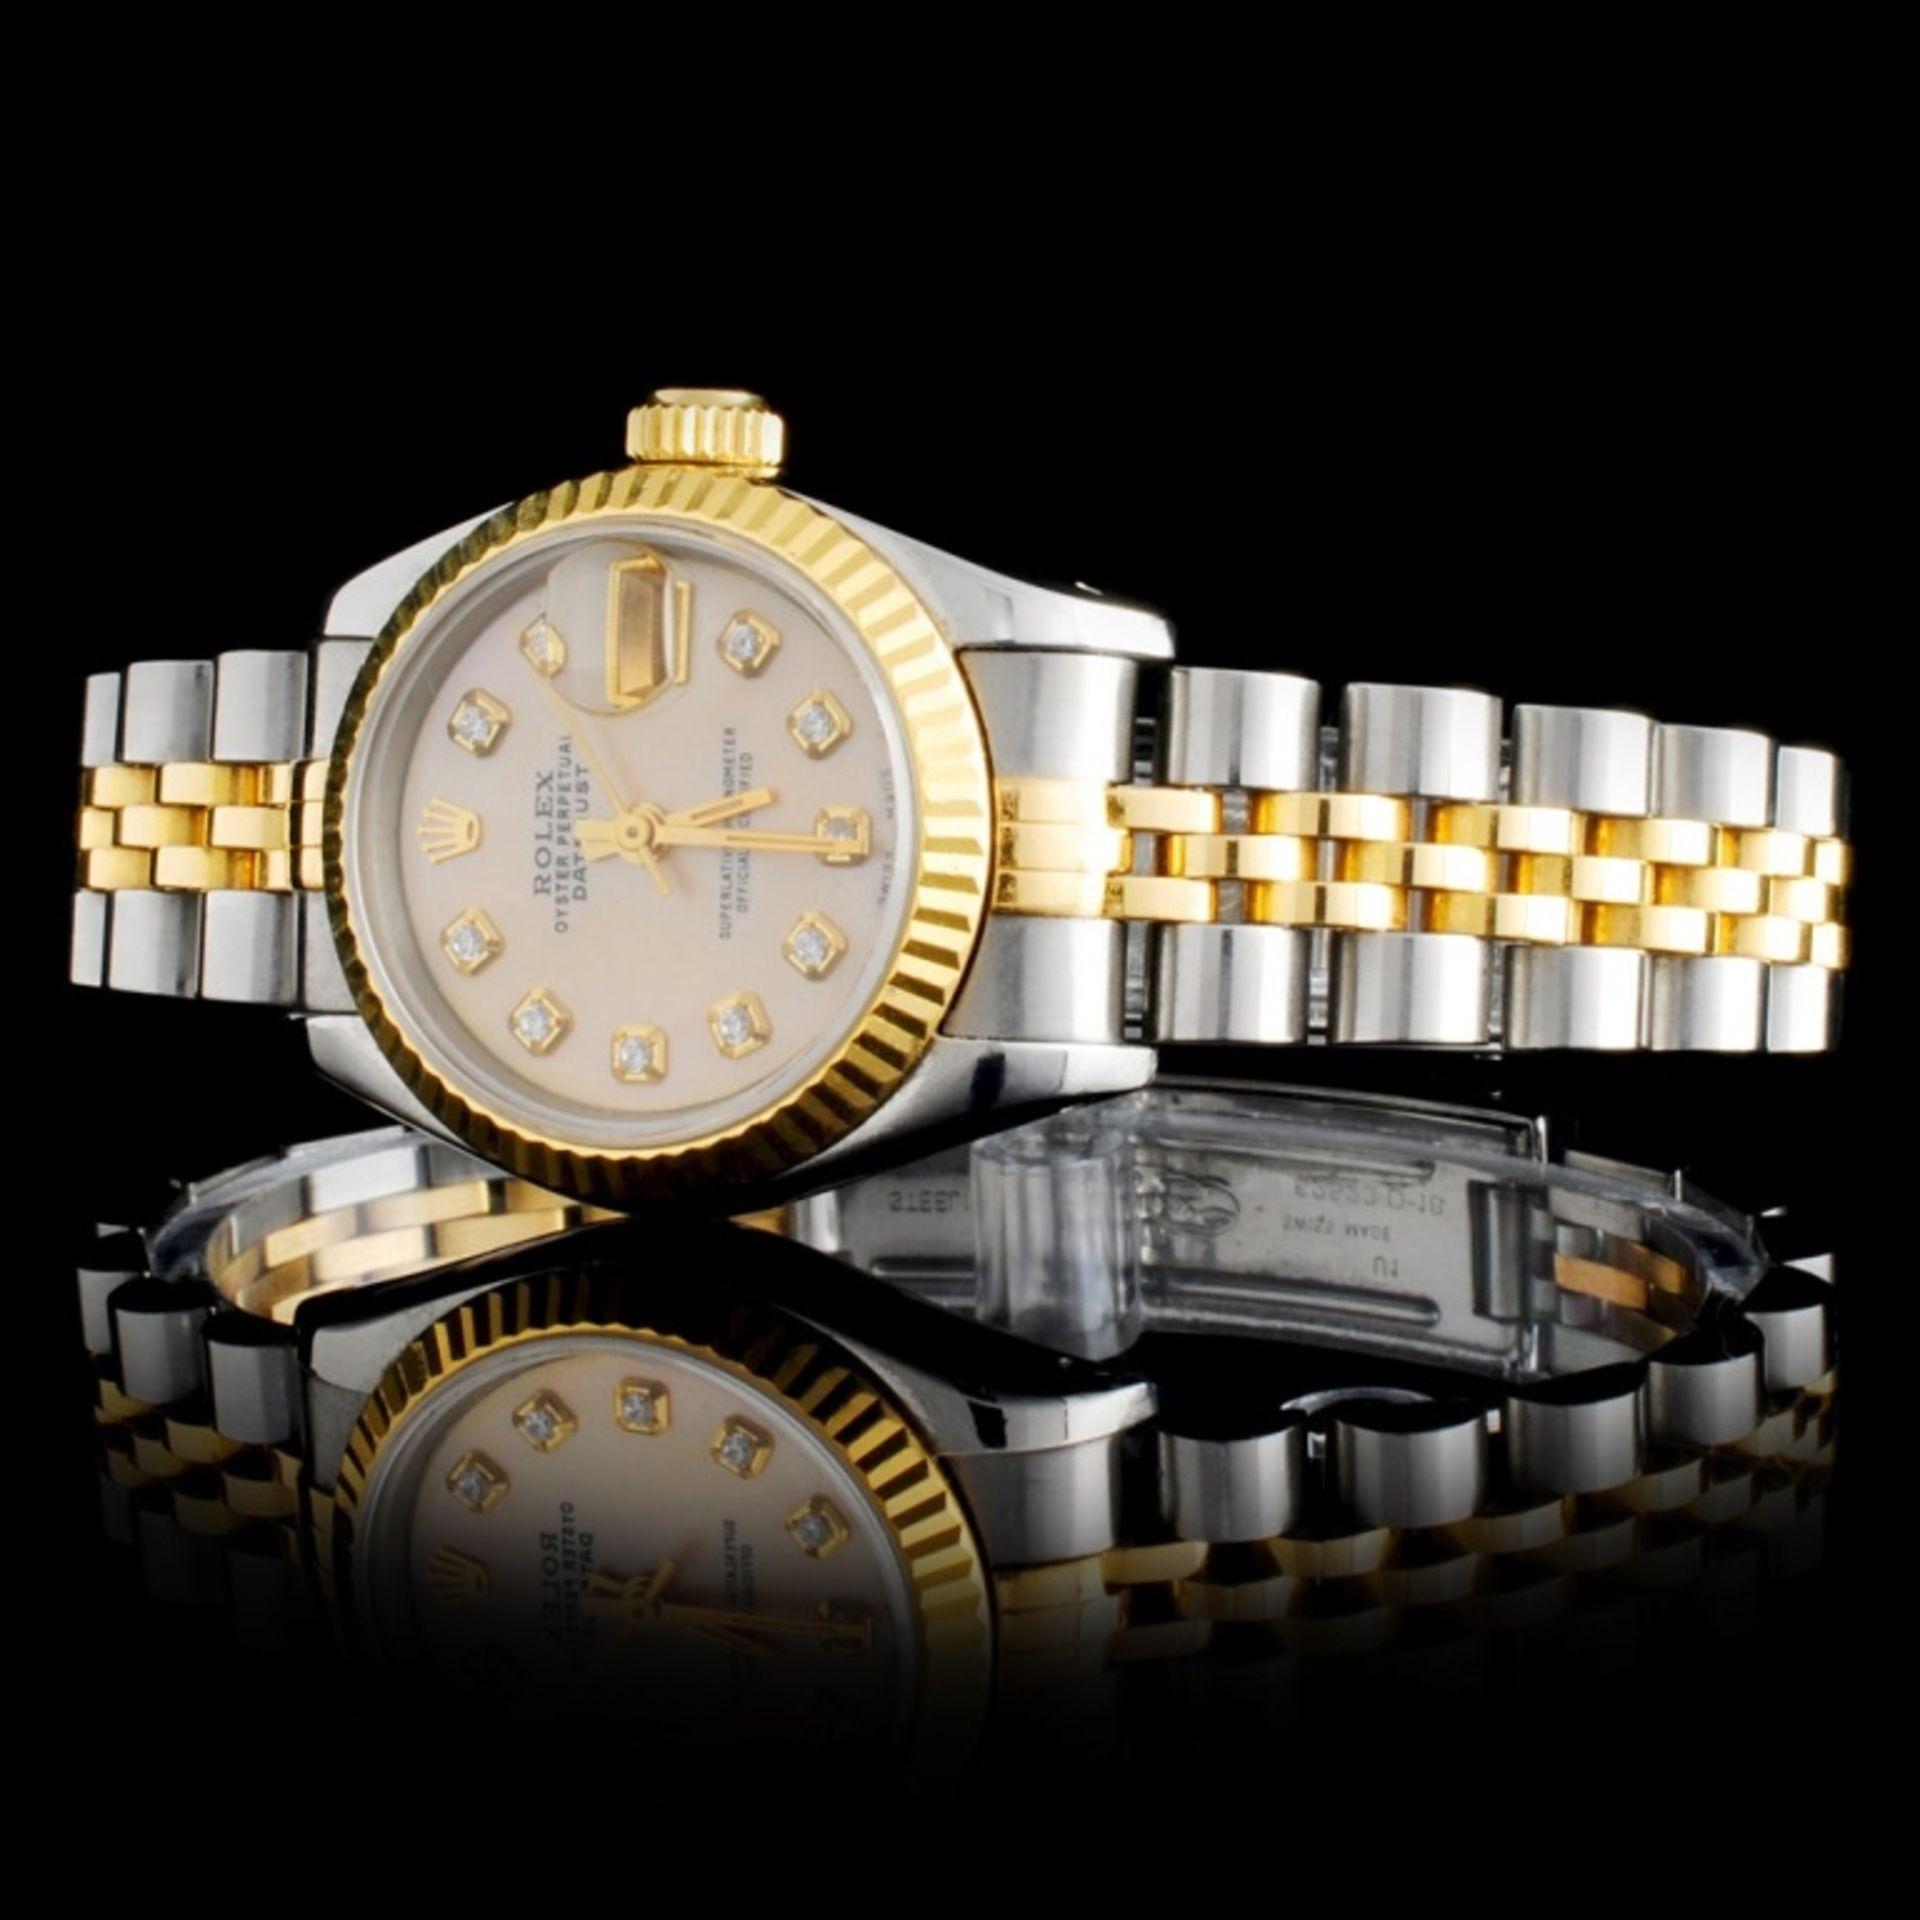 Rolex DateJust Ladies Diamond Wristwatch - Image 2 of 5